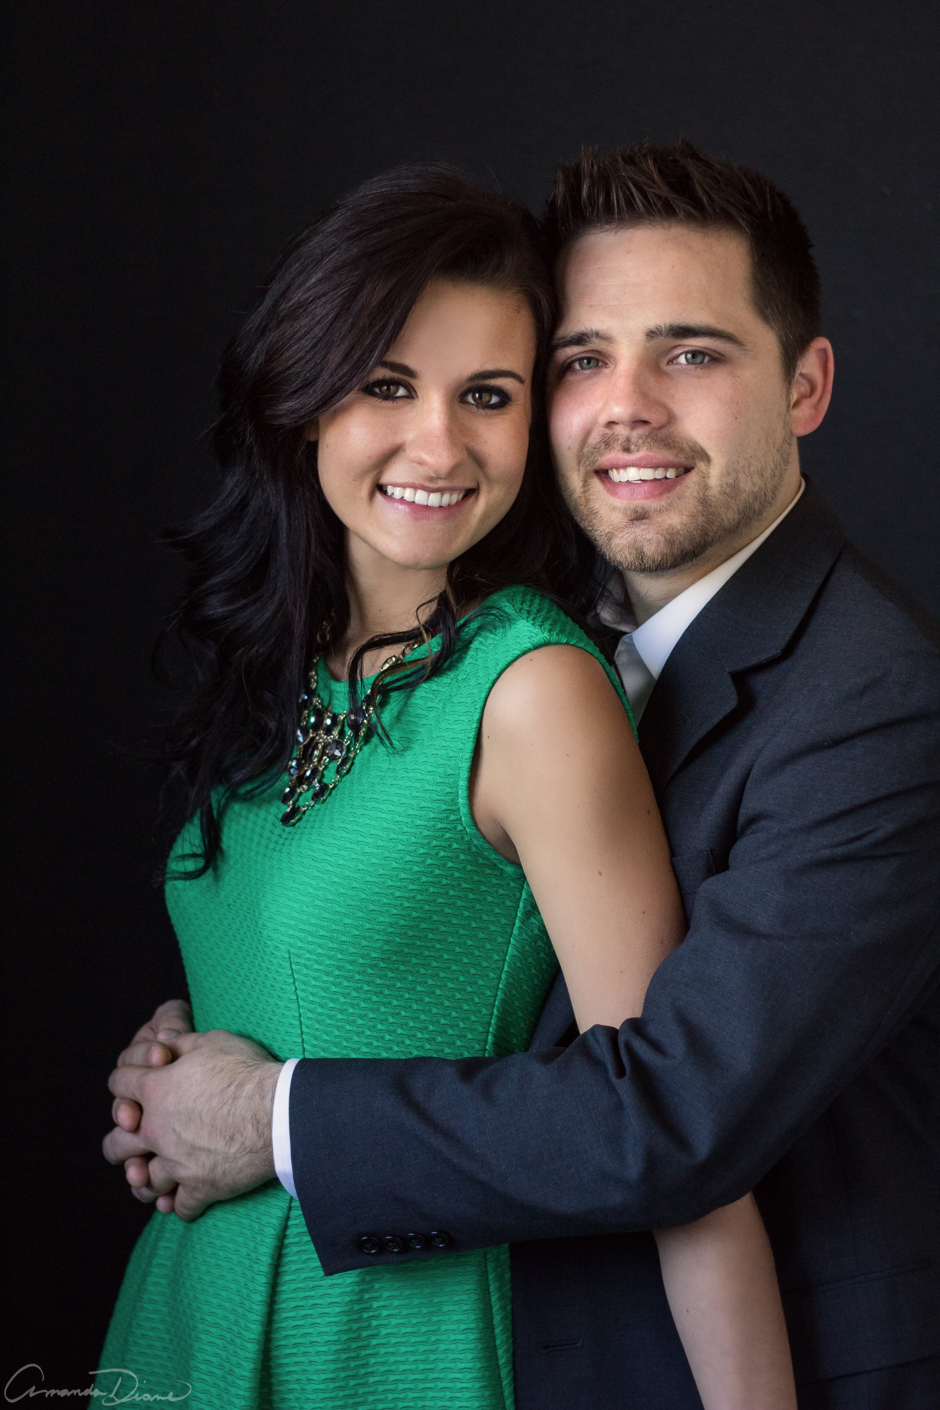 amanda-diane-josh-faith-engagement-1